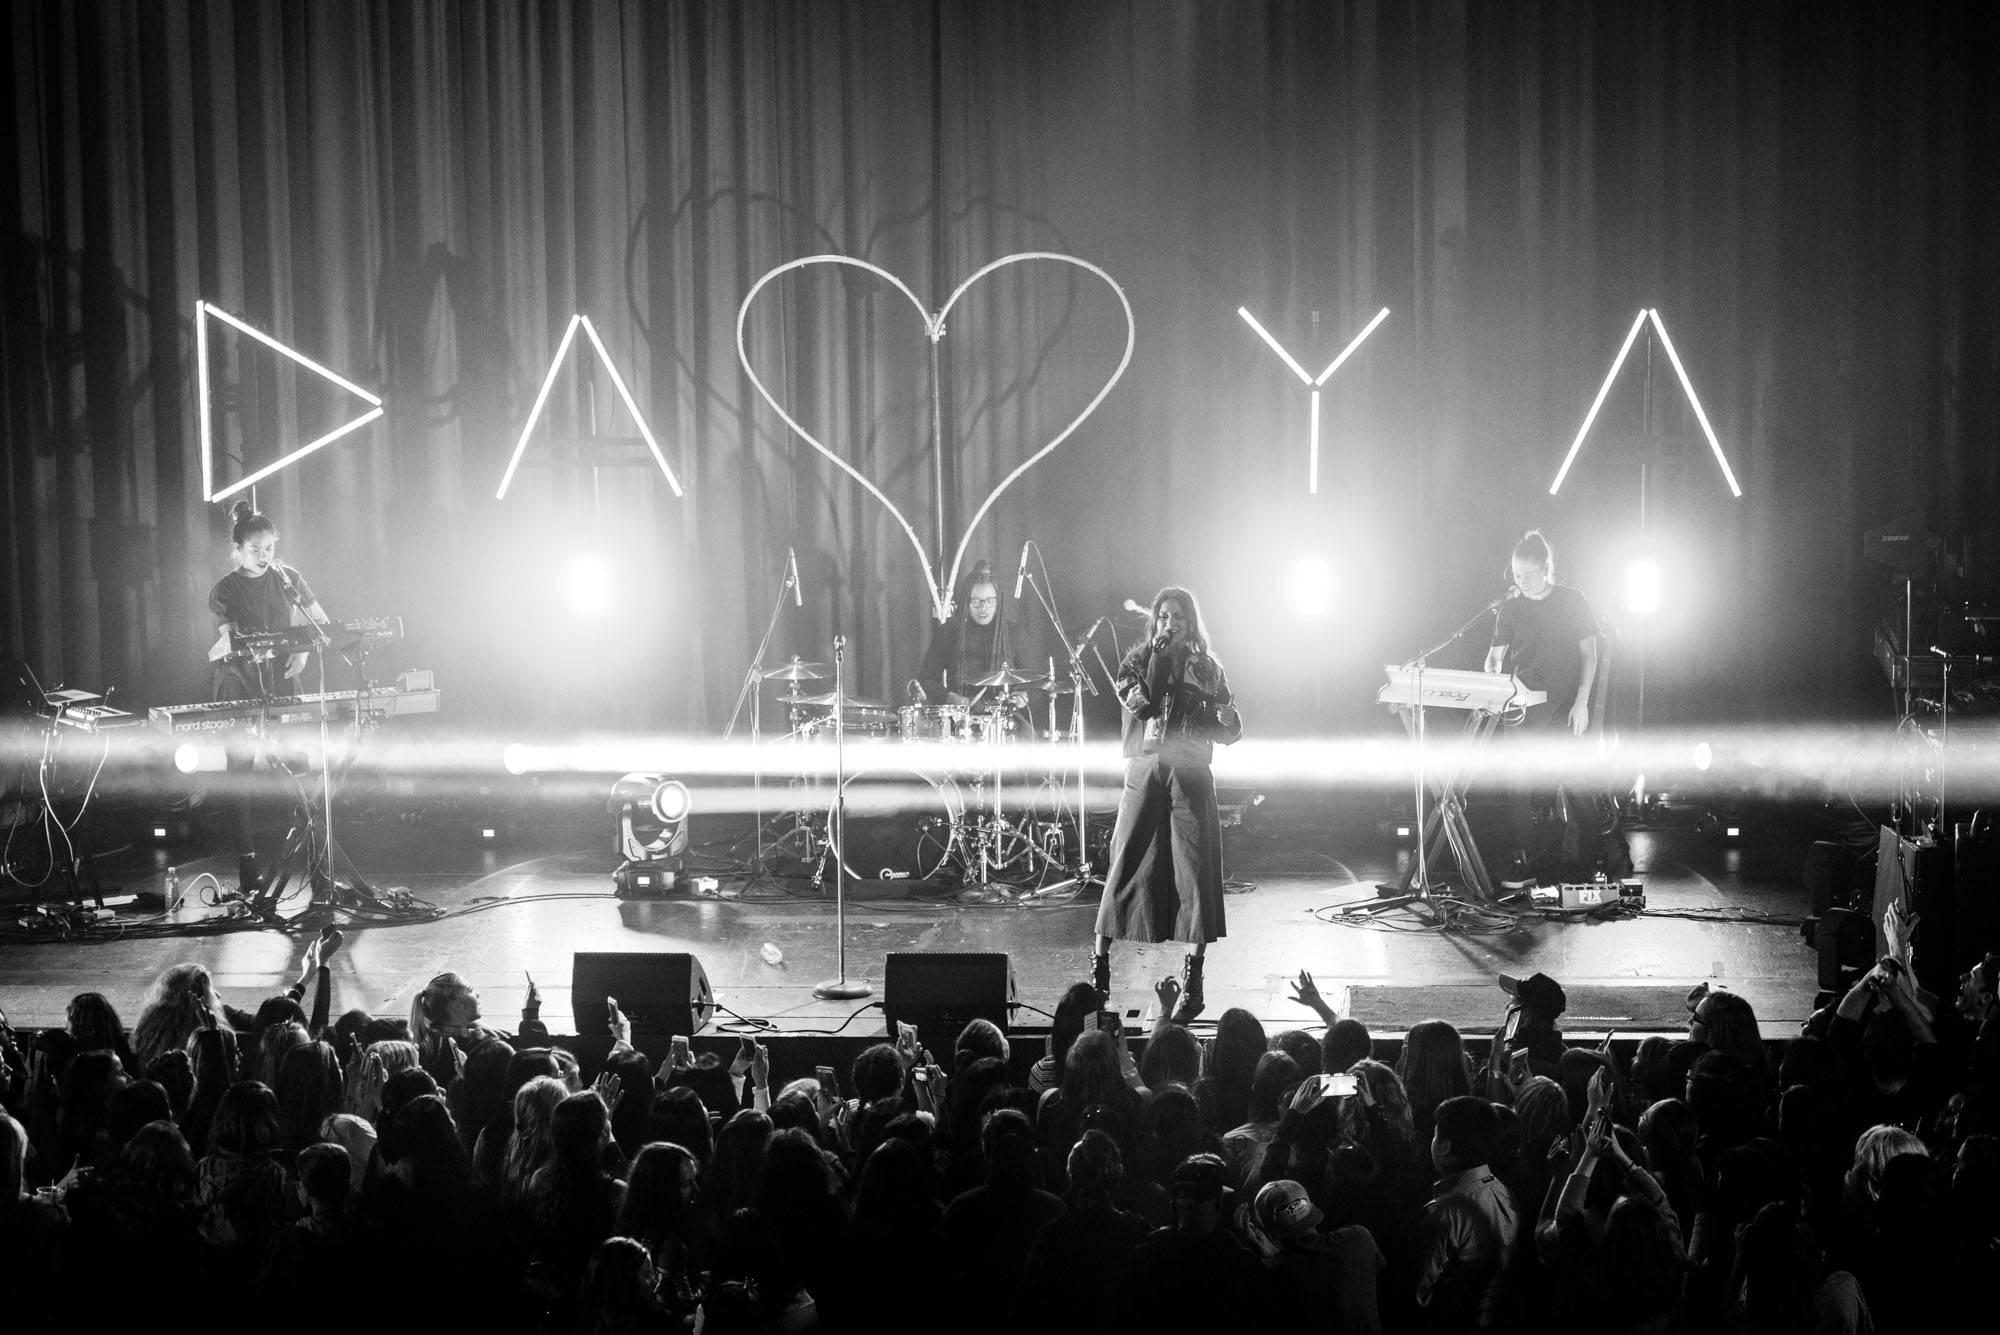 Daya at the Rio Theatre, Vancouver, Mar. 17 2017. Jason Martin photo.